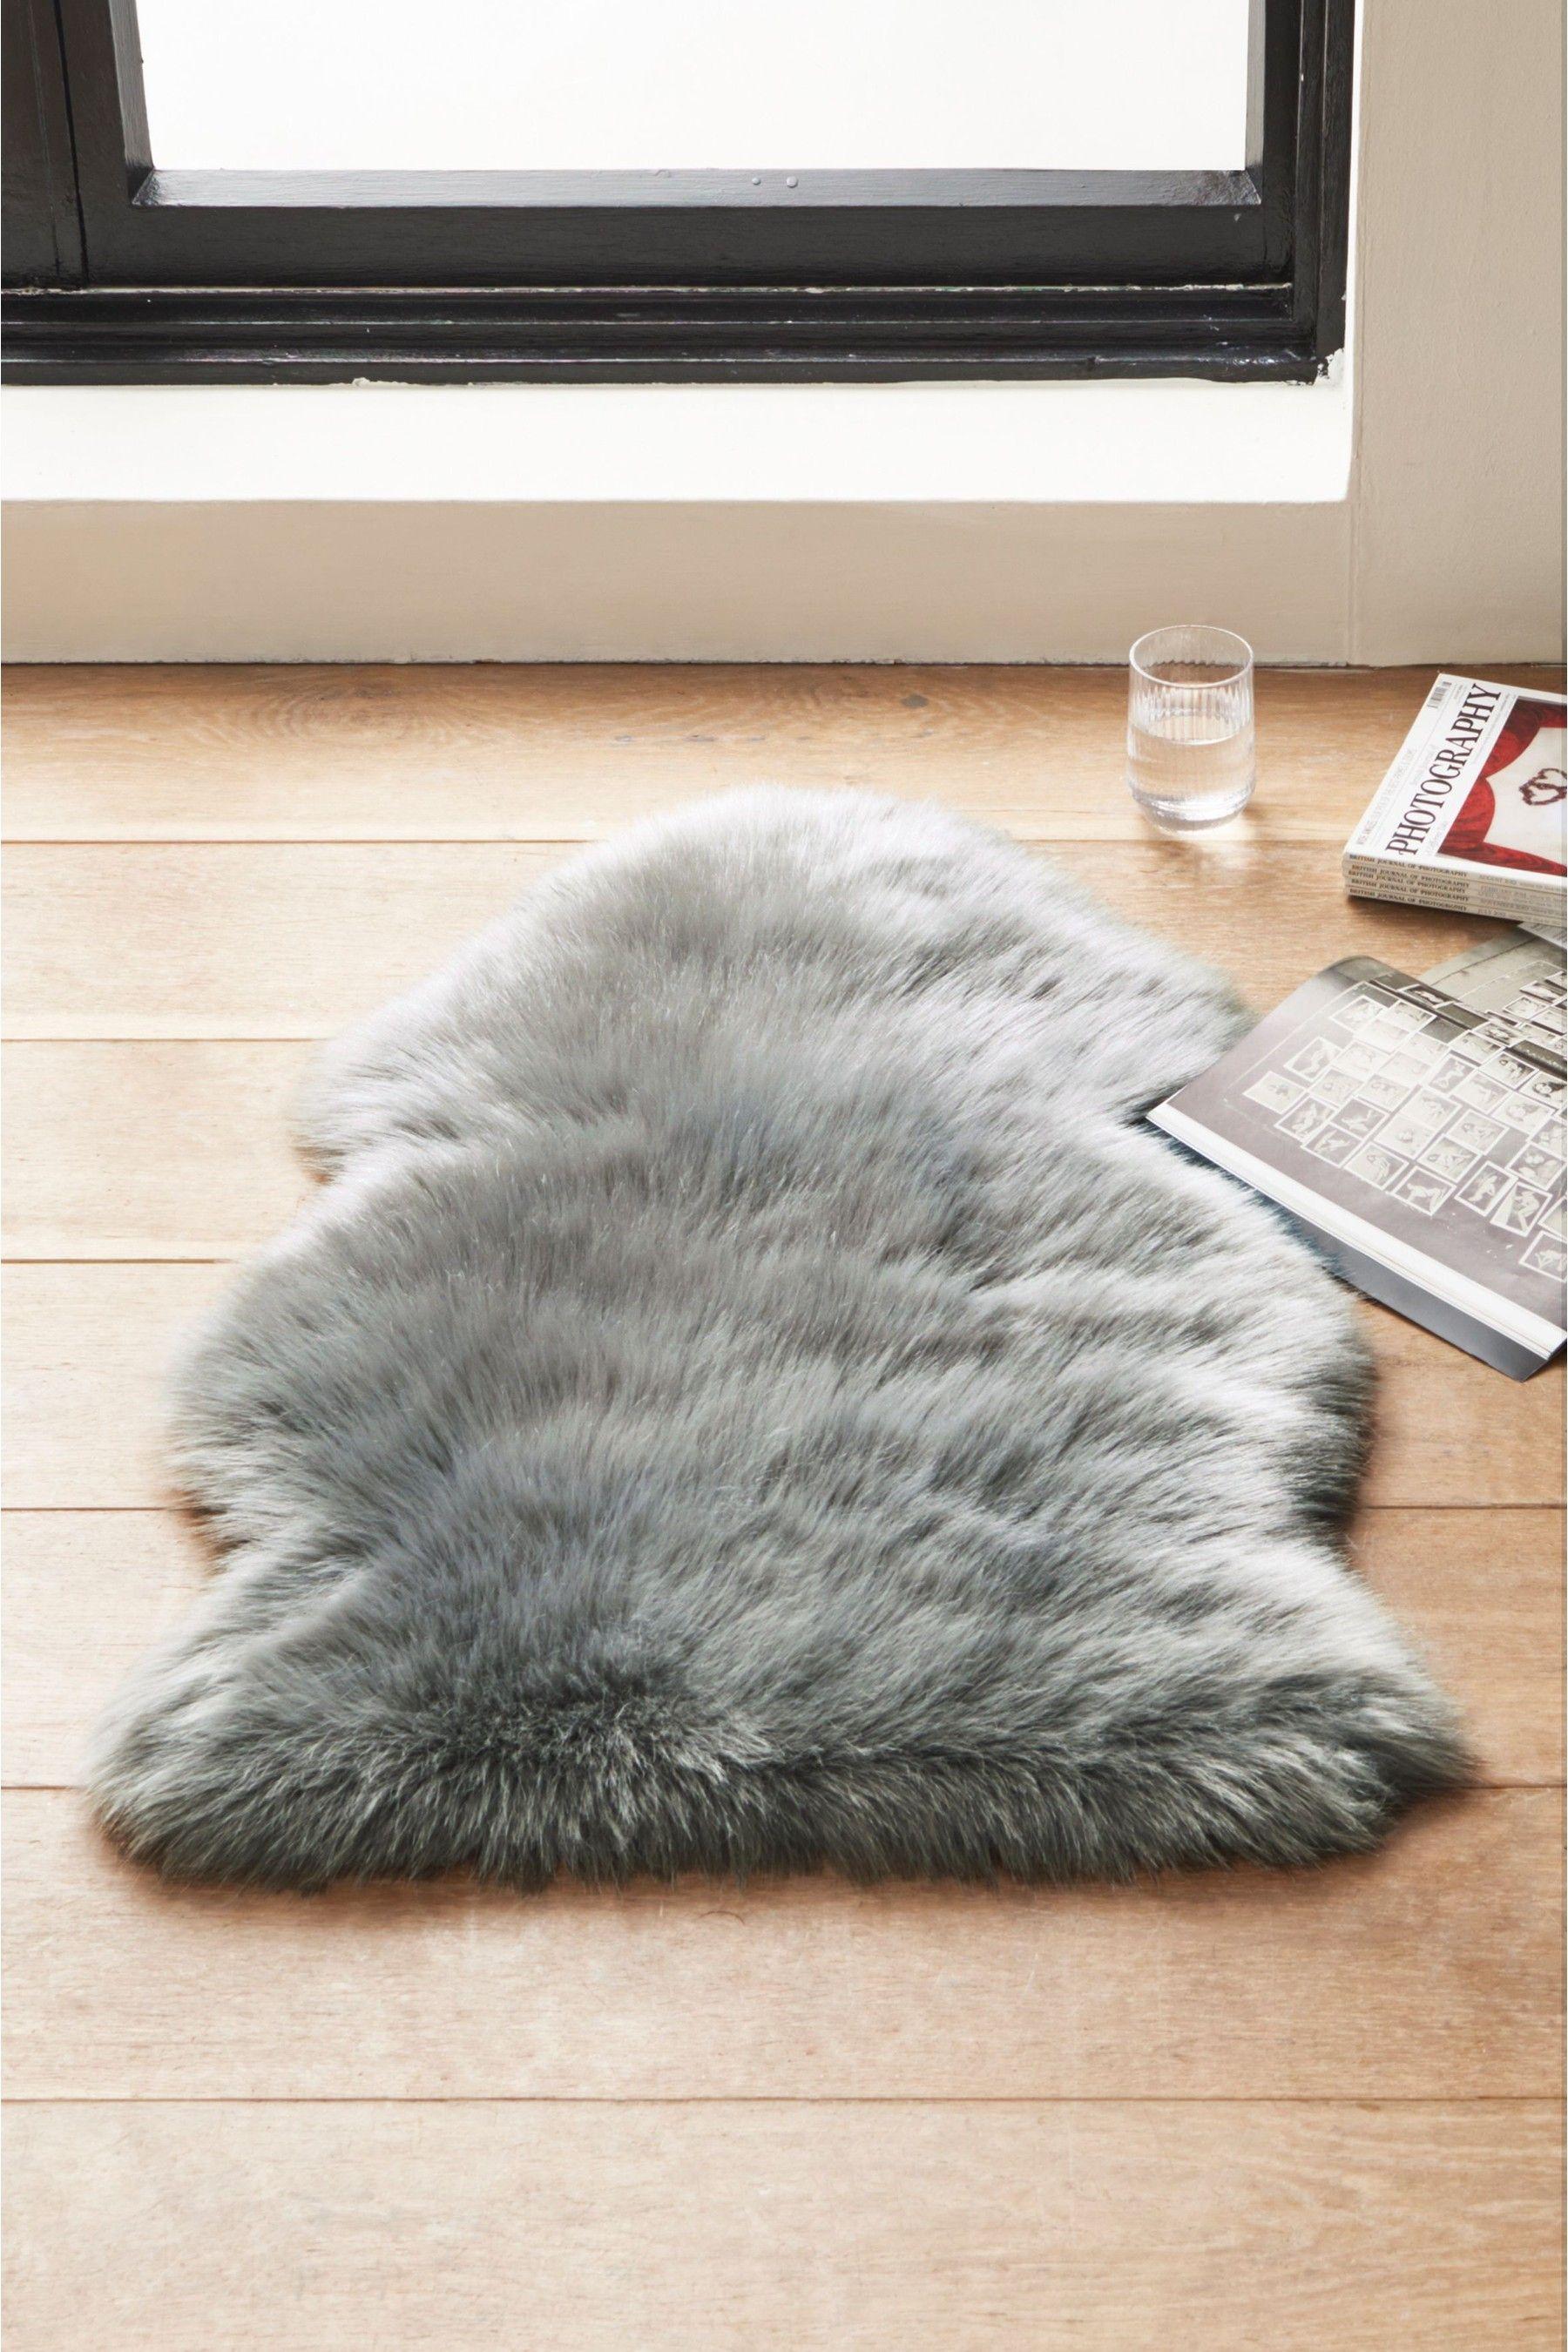 Next Faux Fur Sheepskin Rug Grey Faux Sheepskin Rug Faux Fur Rug Fur Rug [ 2700 x 1800 Pixel ]